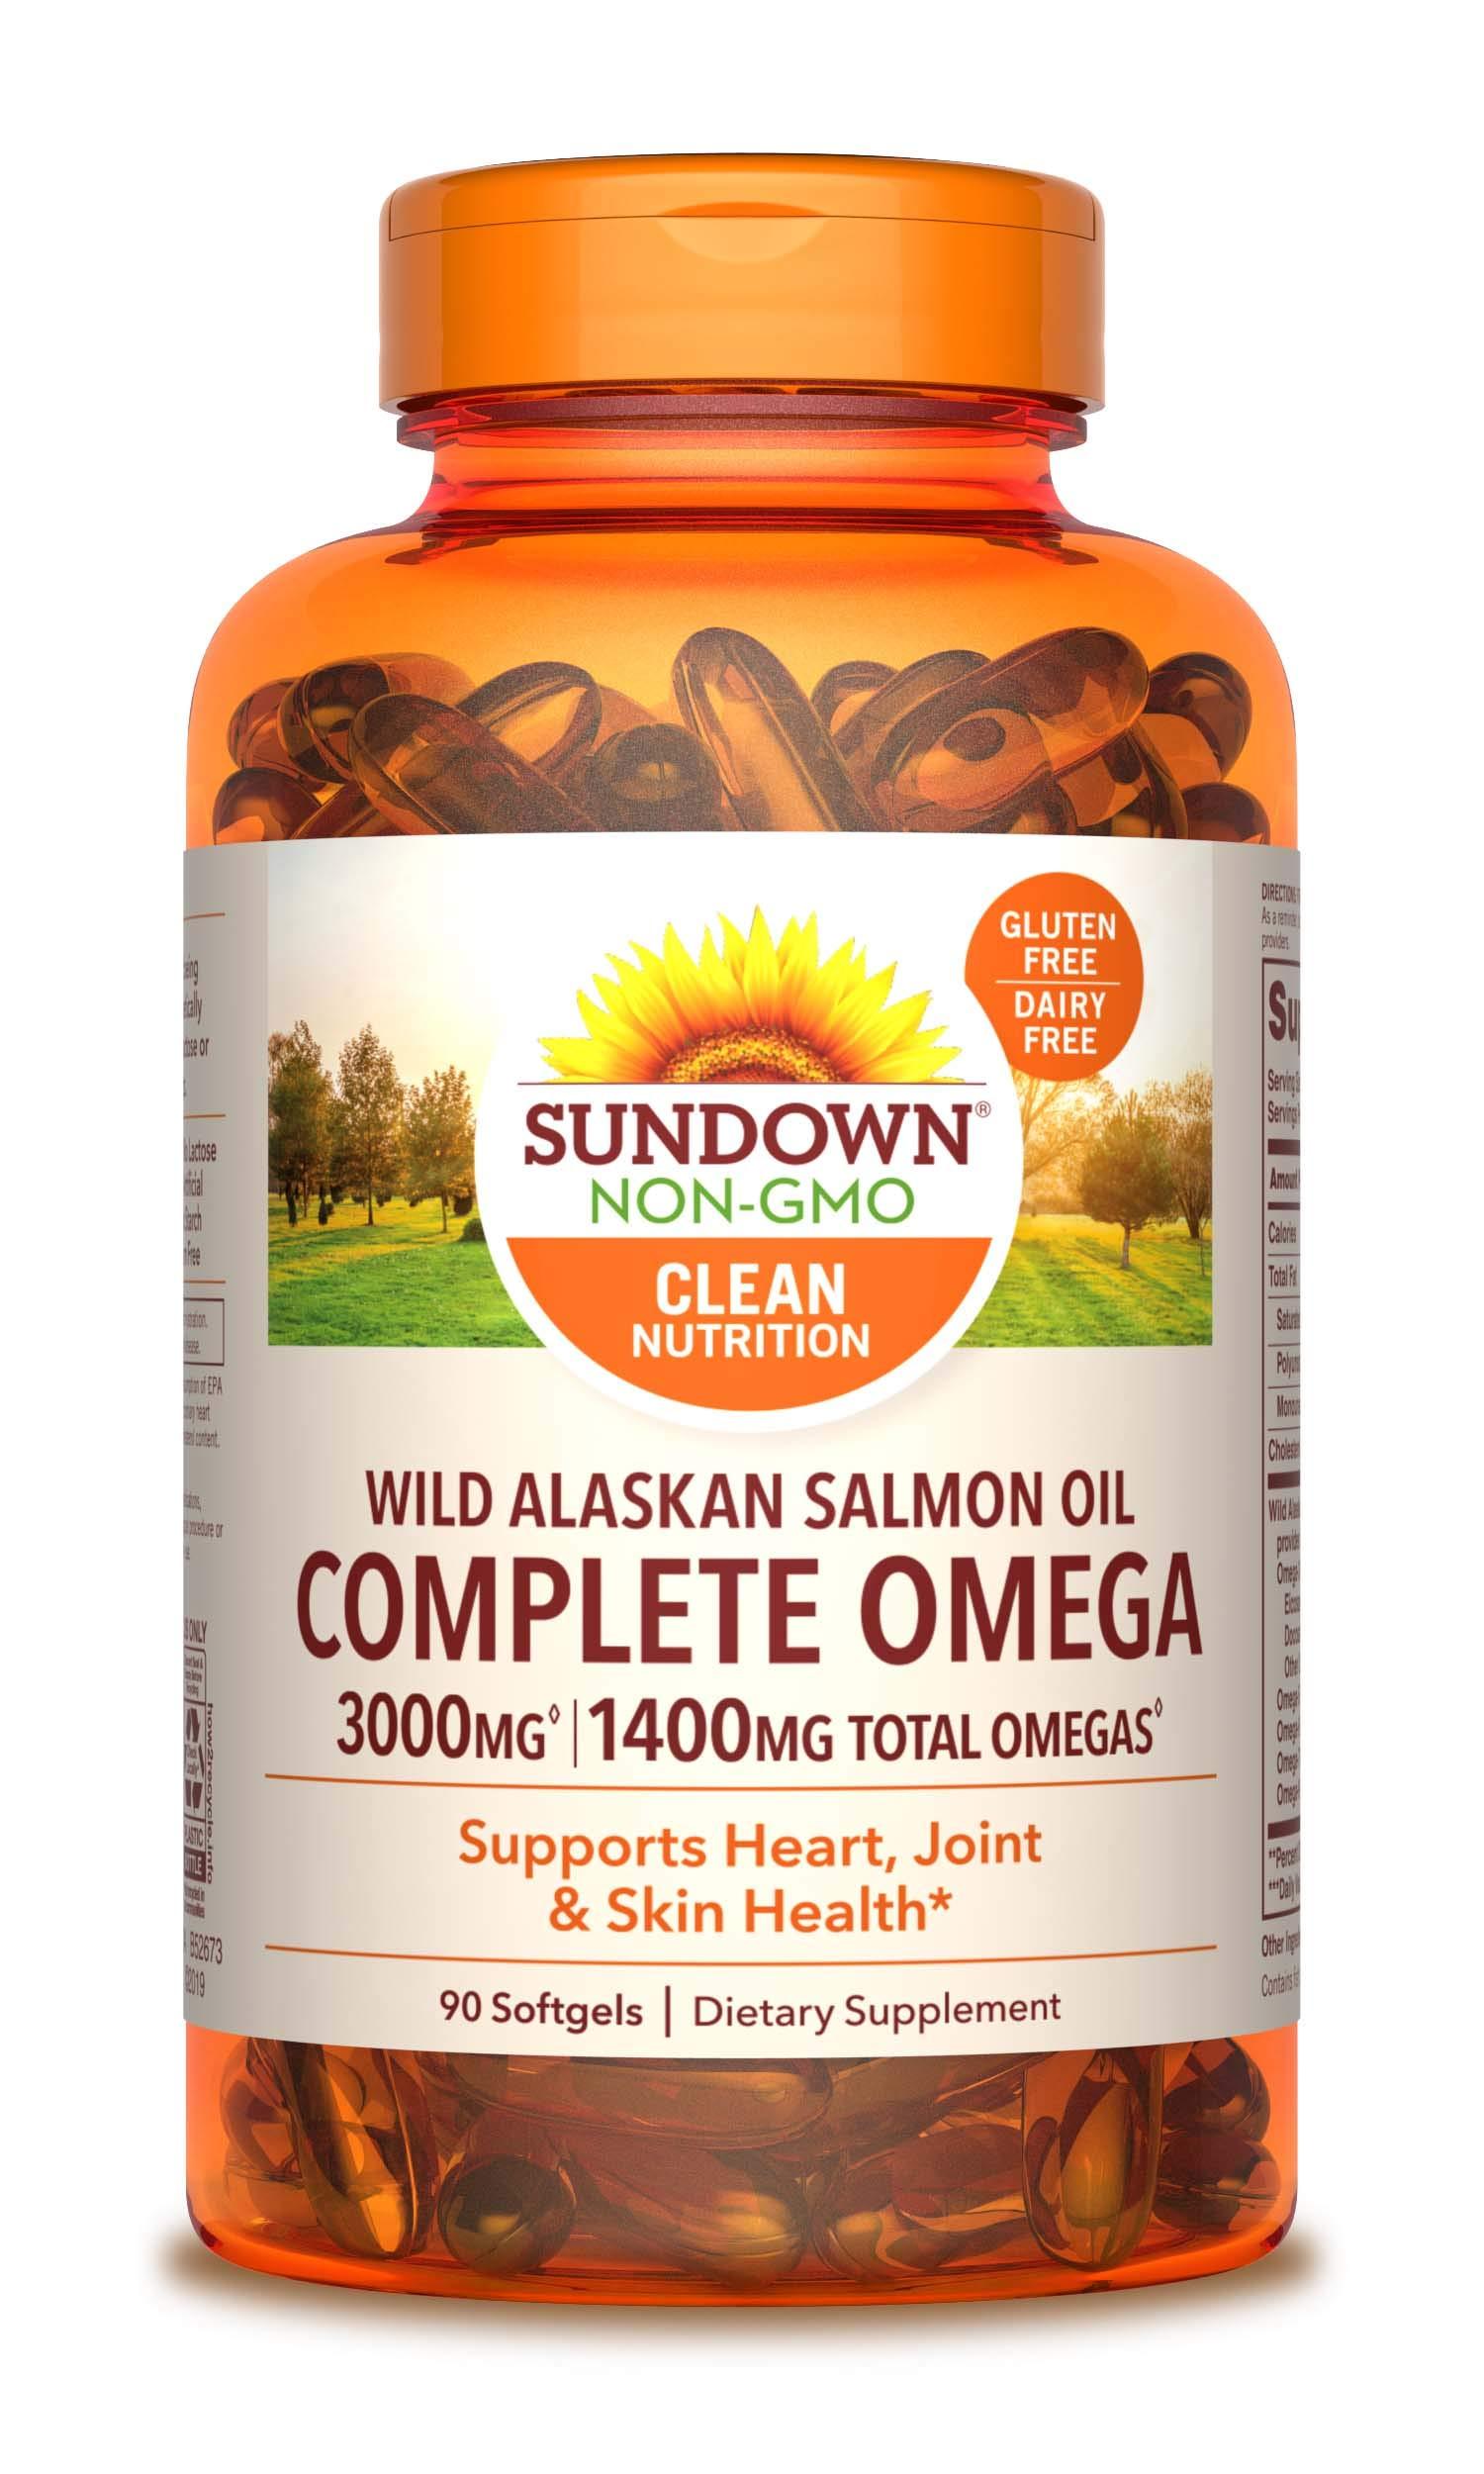 Sundown Complete Omega Wild Alaskan Salmon Oil Softgel, 1400 mg, 90 Softgels (Packaging May Vary)